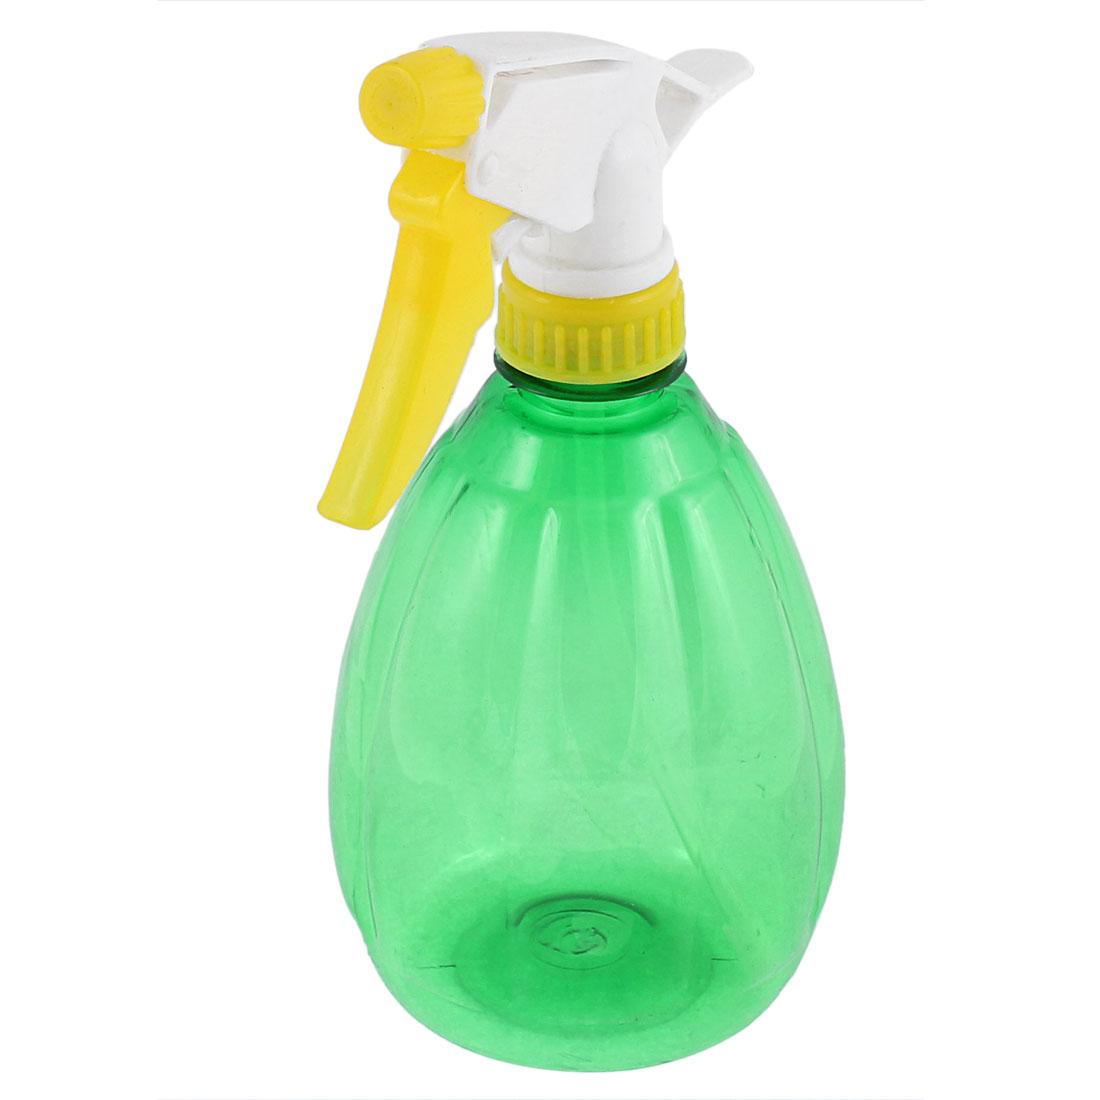 Plastic Hairdressing Flowers Plants Watering Water Trigger Sprayer Spray Bottle Green 500ml